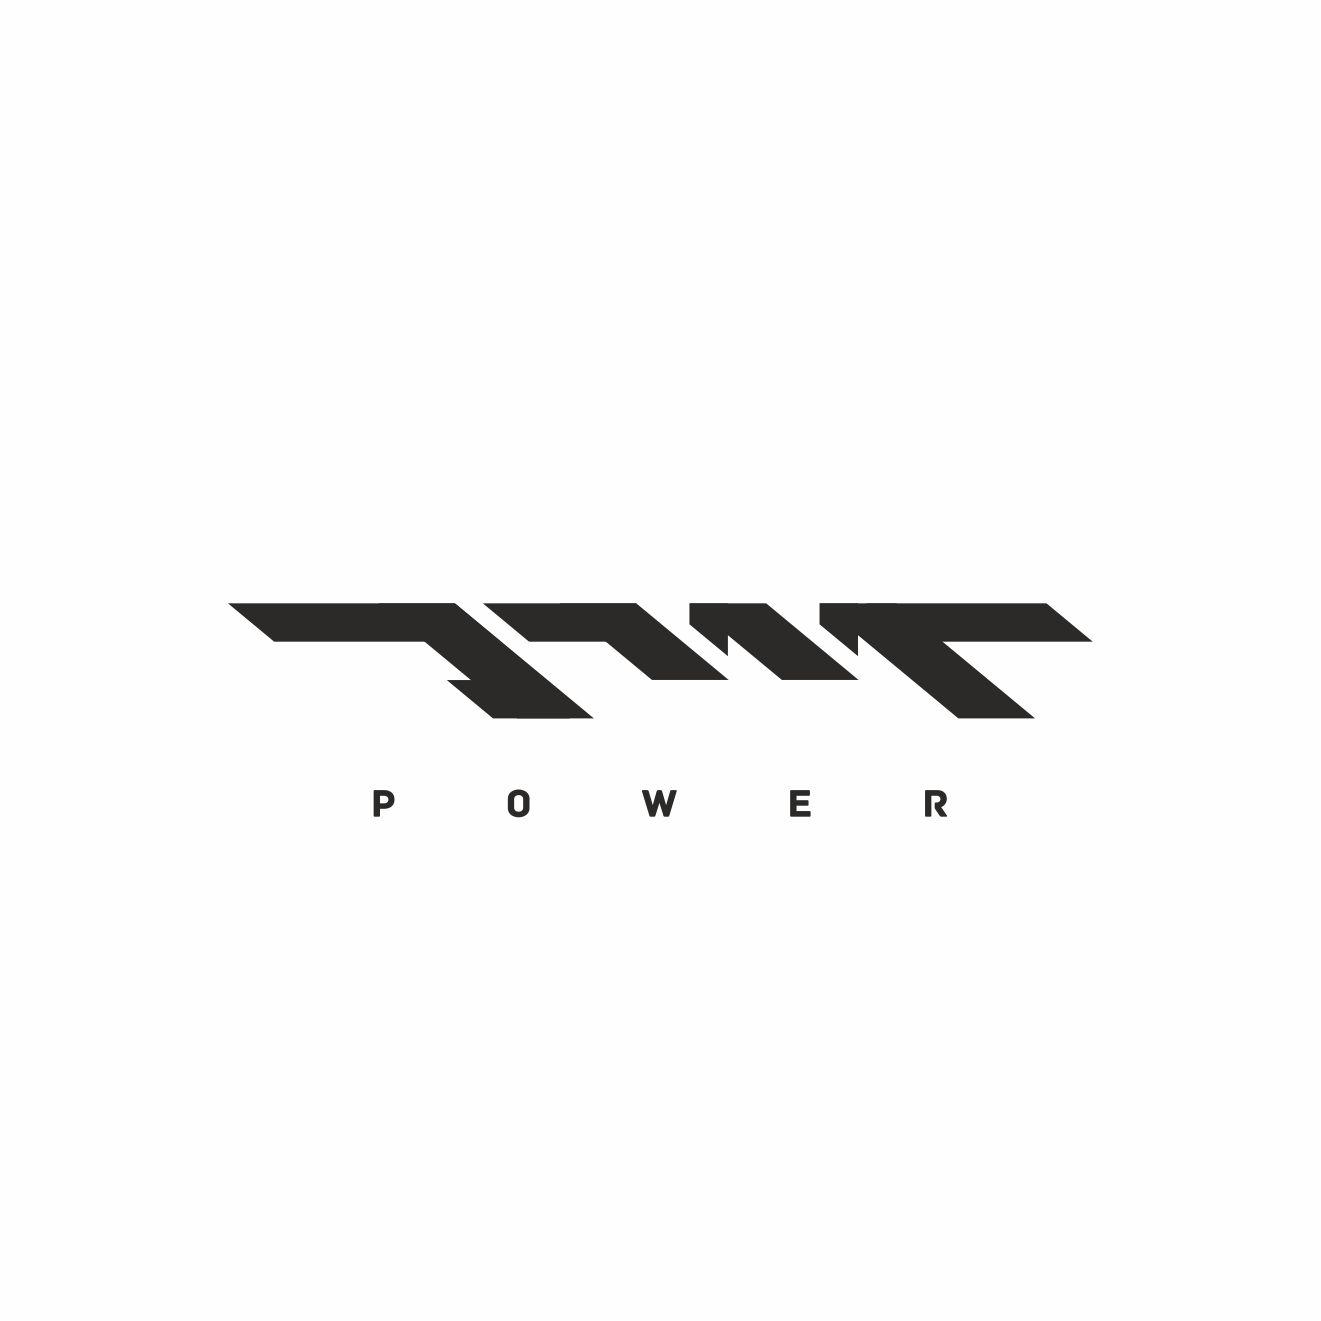 Логотип для Тюнинг Ателье фото f_287553b209cb12b1.jpg